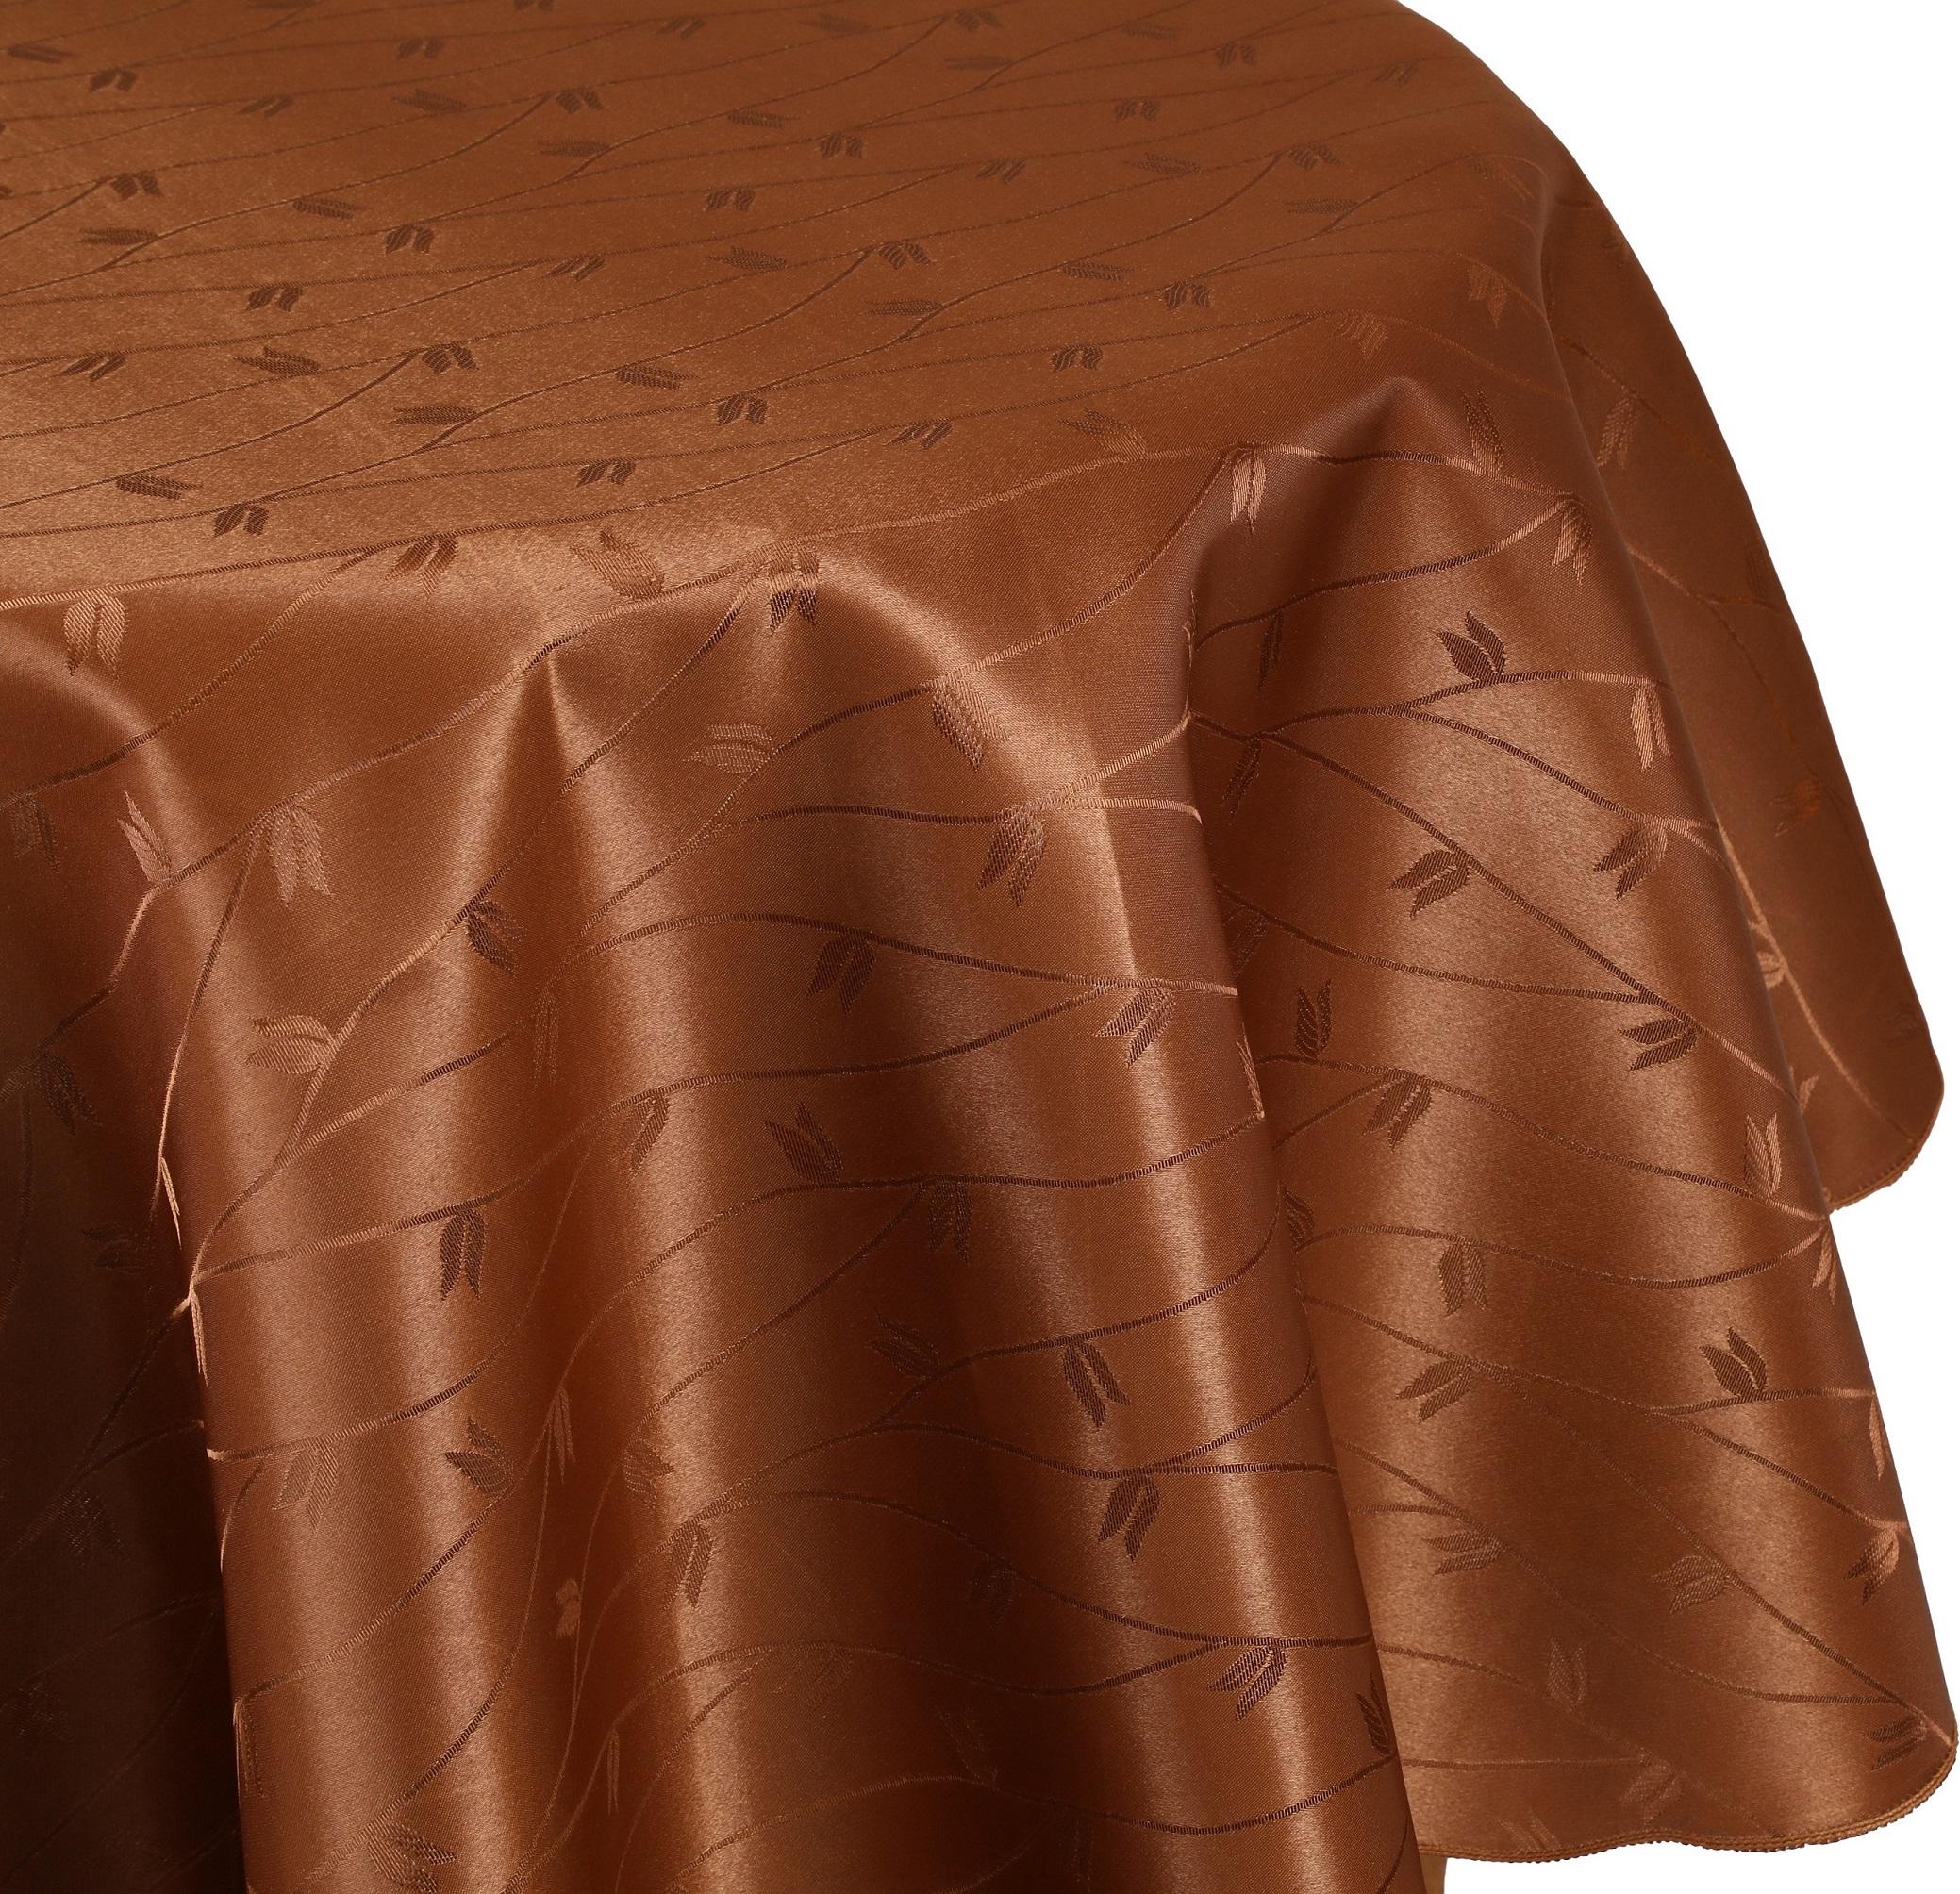 betz nappe jacquard linge de table dessin 6 couleur bronze. Black Bedroom Furniture Sets. Home Design Ideas